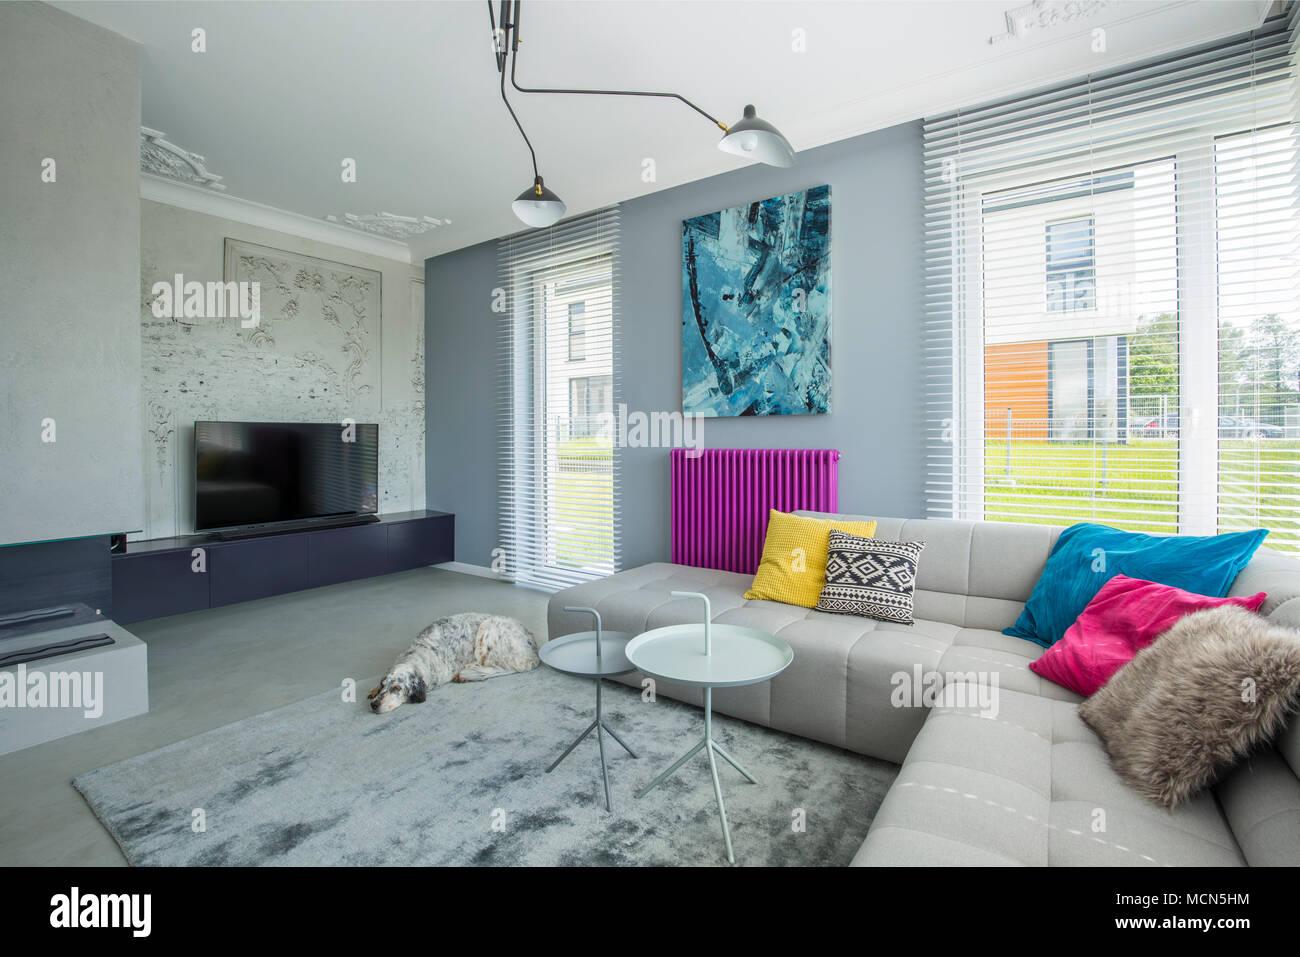 Stylish Gray, Spacious Movie Room Interior With Large Sofa, Tv, Bio  Fireplace, Sleeping Dog And Creative Colorful Decorations